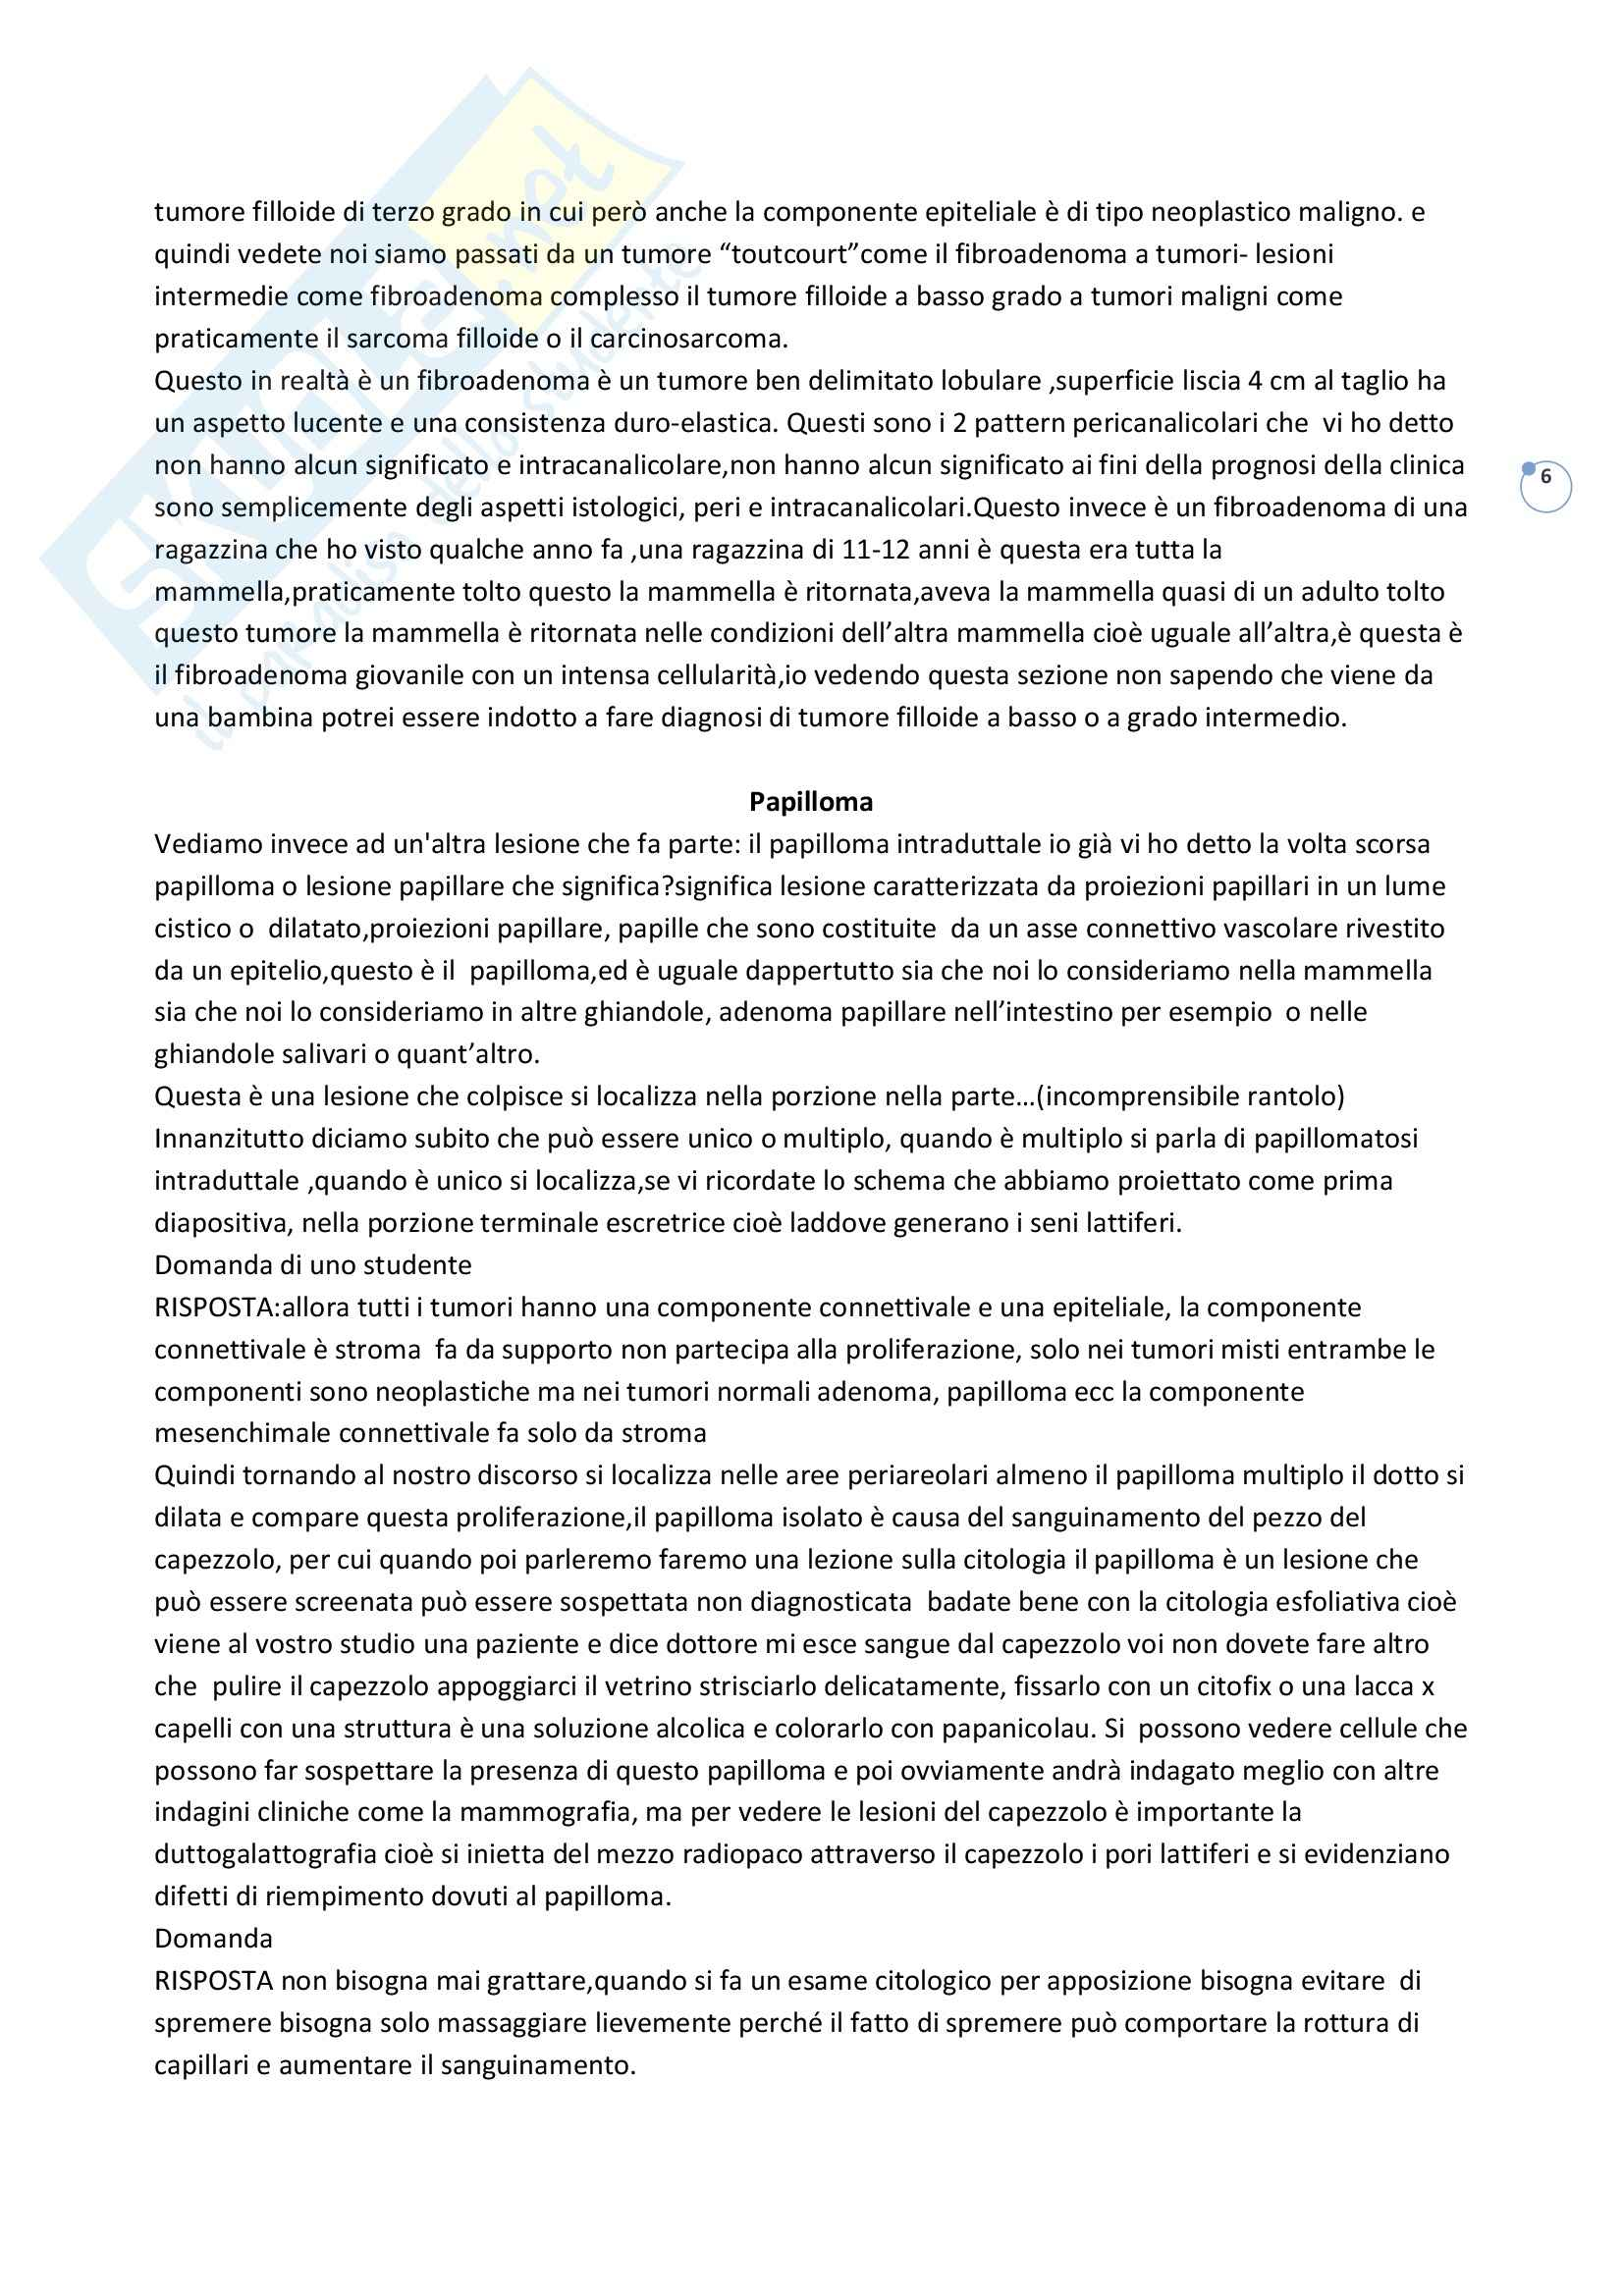 Anatomia patologica - lesioni proliferative Pag. 6